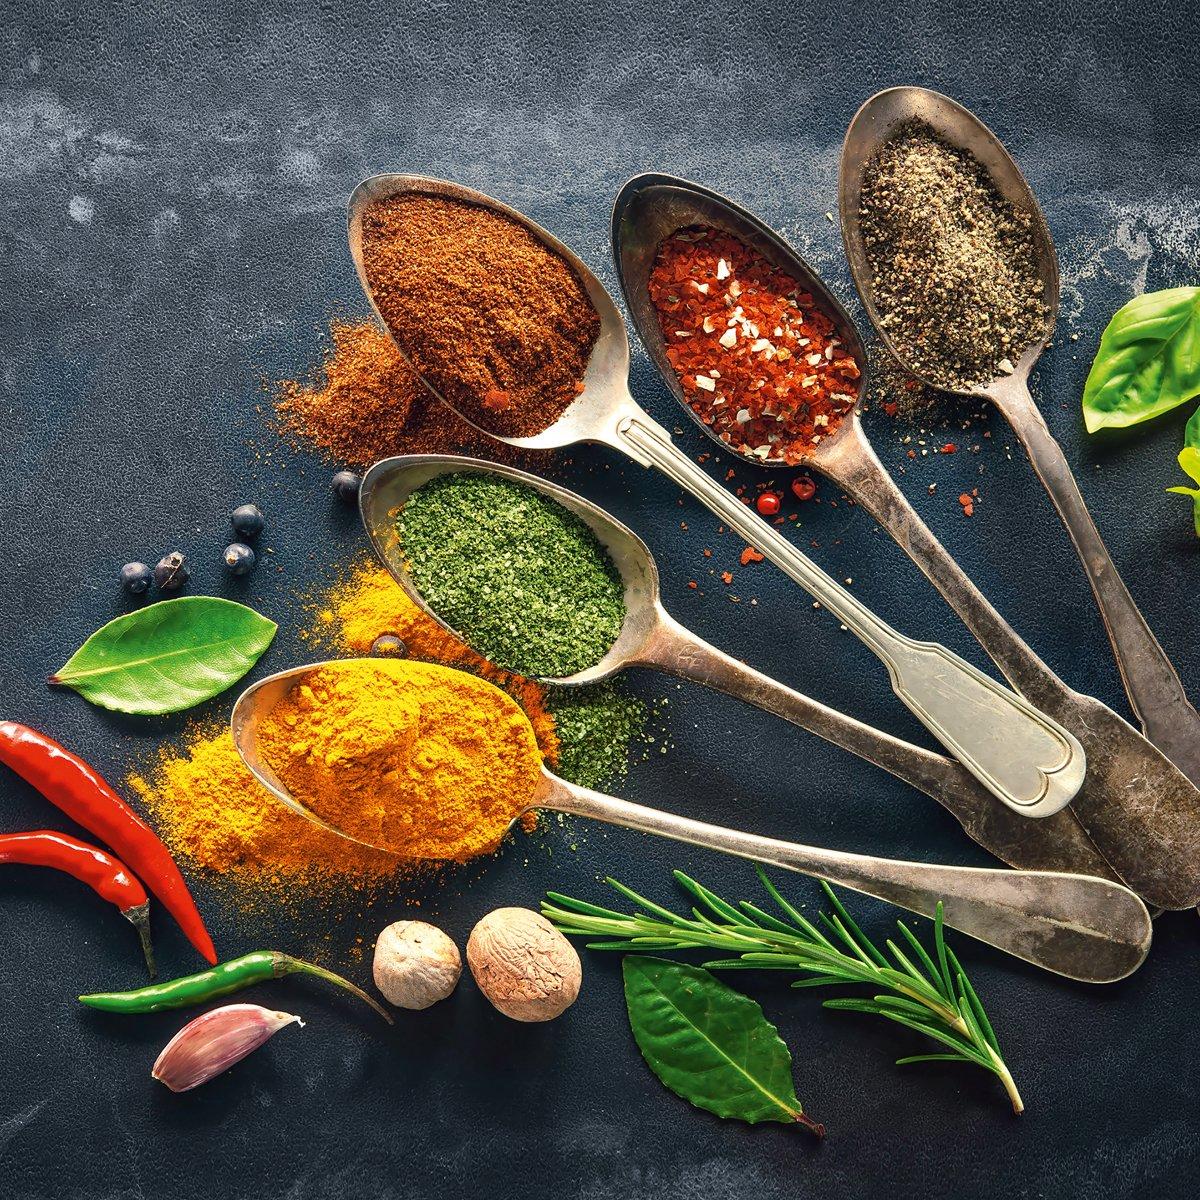 Eurographics DG dc1178Colorful Spices On Spoons I 30X 30quadro in vetro, vetro, multicolore, 30x 30x 2cm DG-DC1178